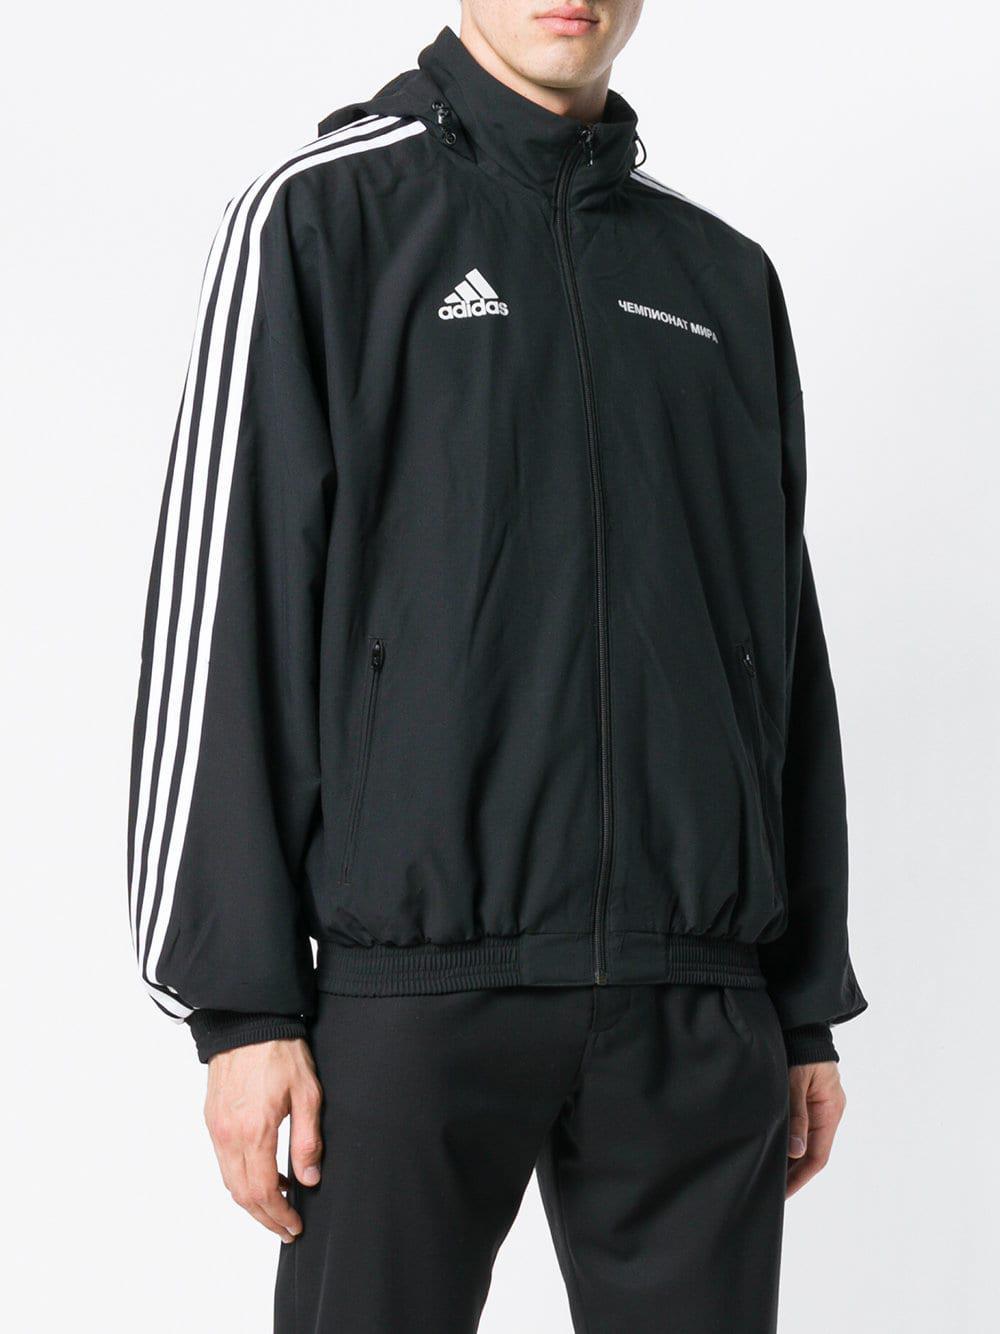 Gosha Rubchinskiy X Adidas Trainingsjacke in Black für Herren